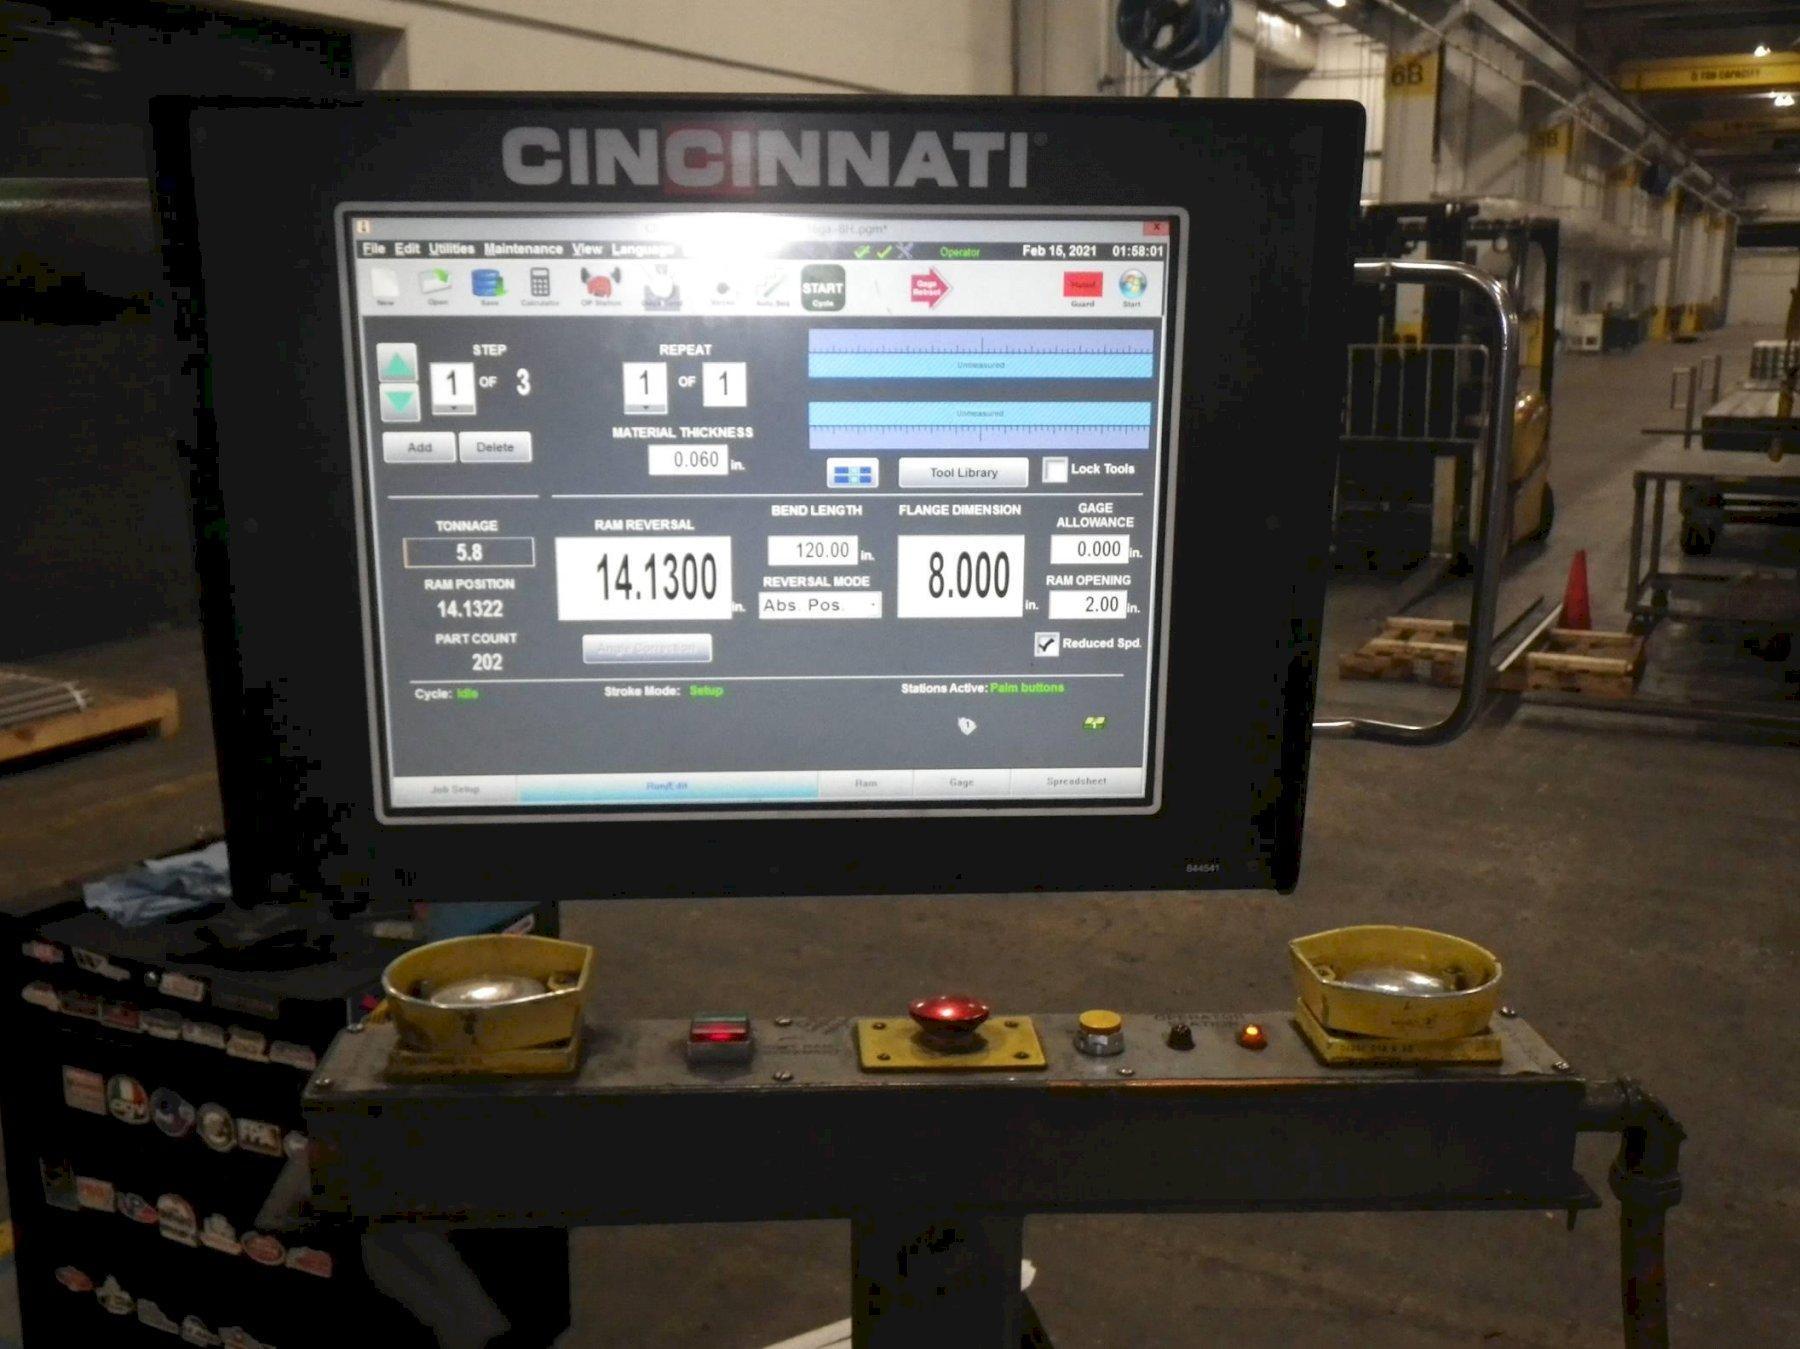 1996 Cincinnati 350CB2x12, 14' x 350 Ton CNC Hydraulic Press Brake